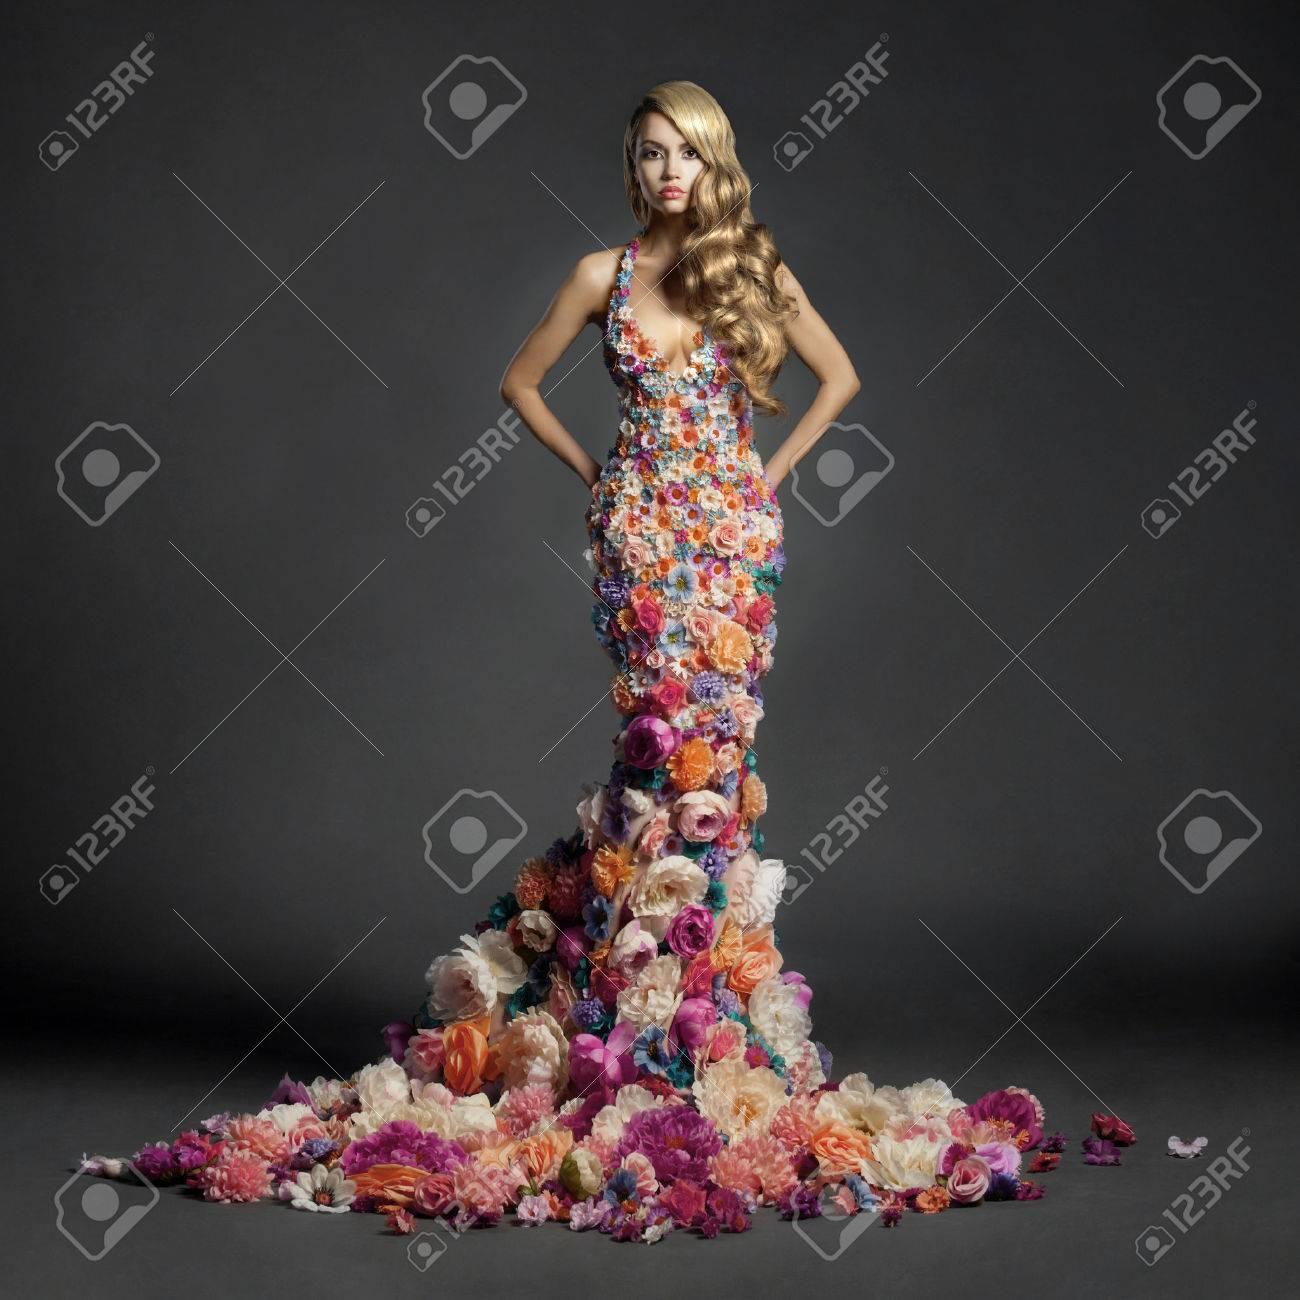 Studio portrait of blooming gorgeous lady in dress of flowers Standard-Bild - 33634380